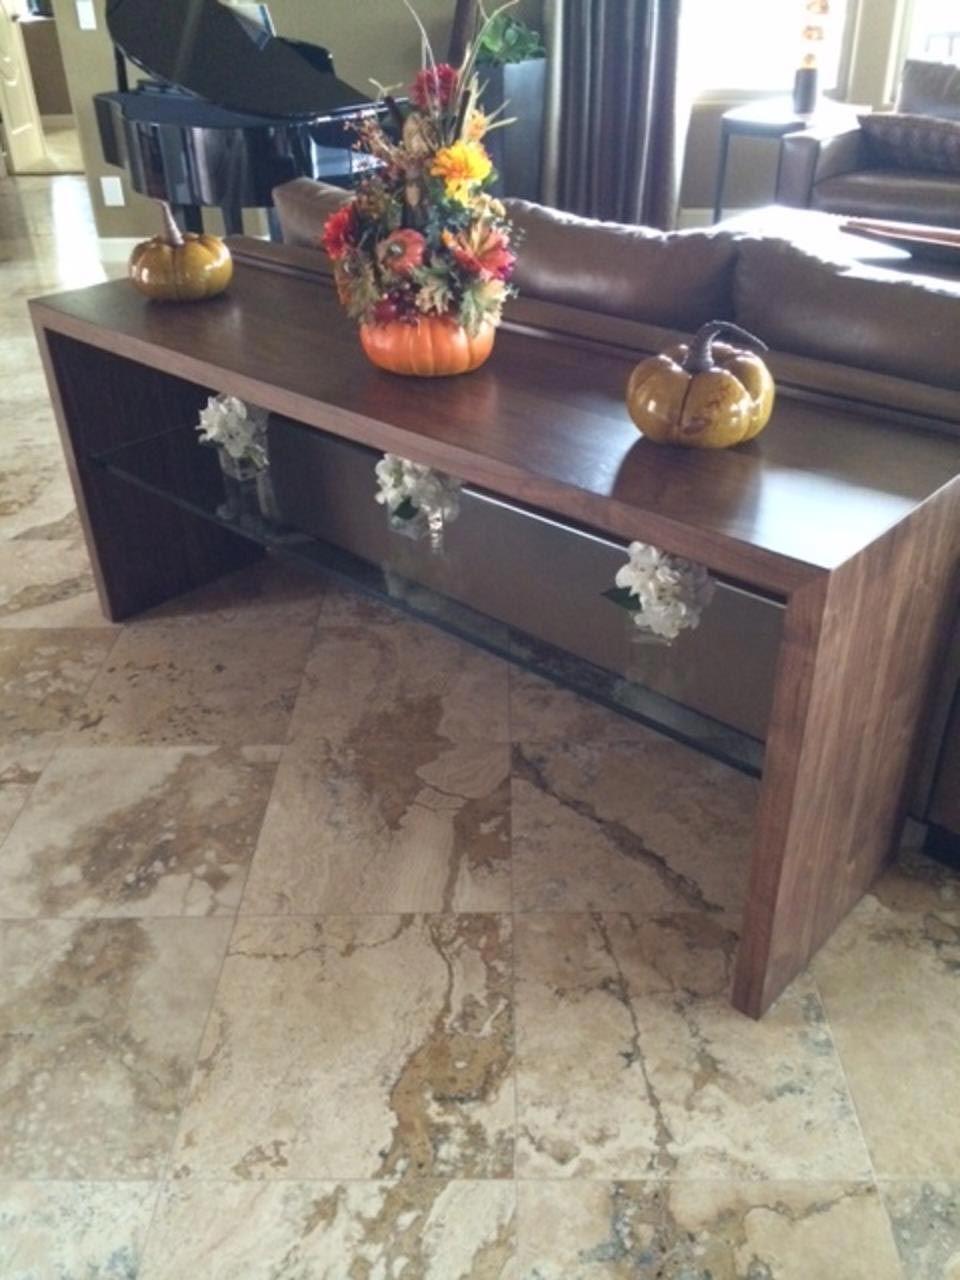 Handcrafted Reclaimed Wood Sofa Table By Peter Thomas Designs In Phoenix Az Custom Vintage Furniture Reclaimedwood Barnwood Unique